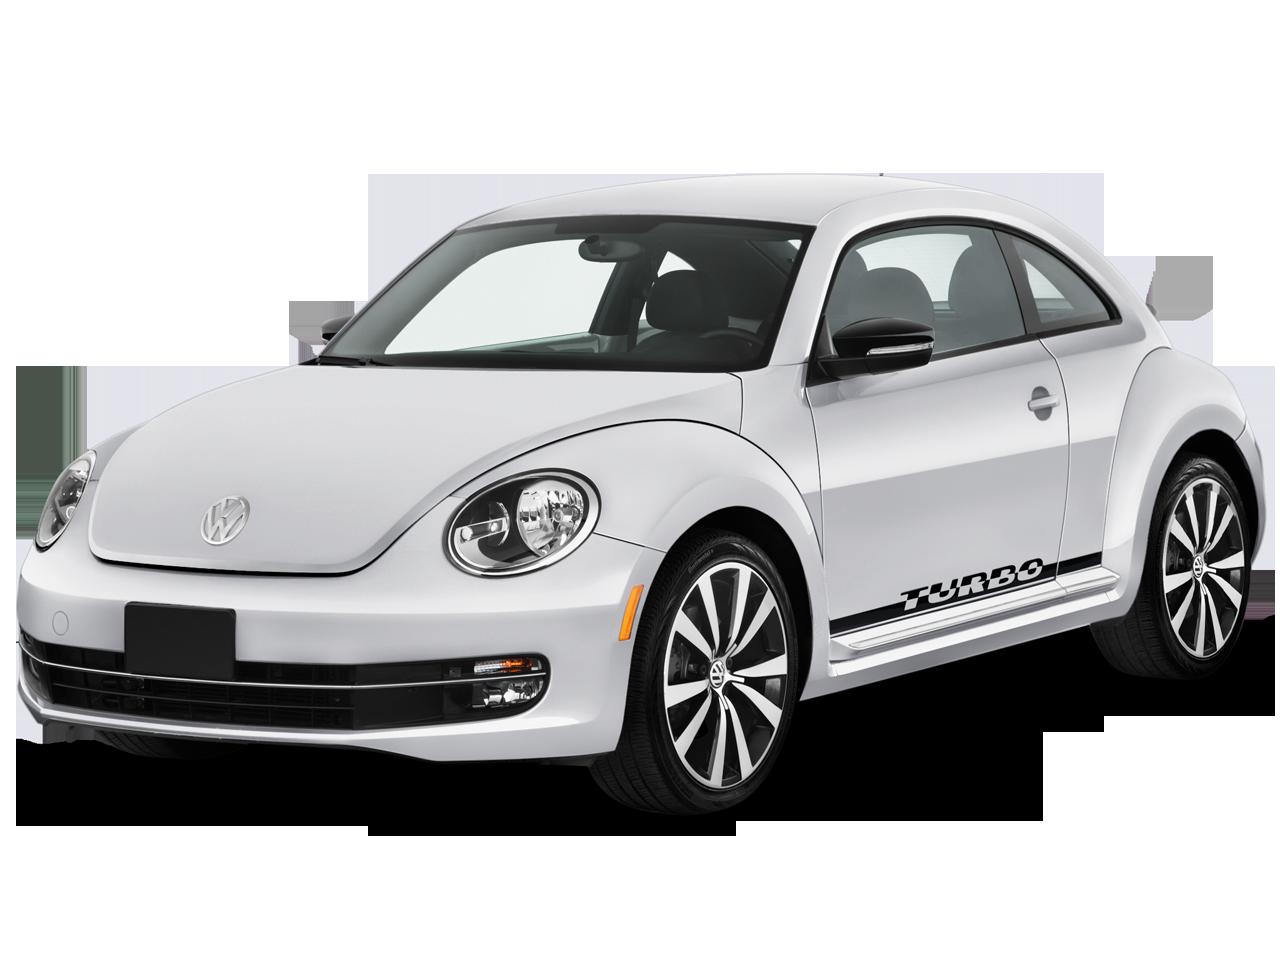 White Volkswagen Beetle PNG car image.